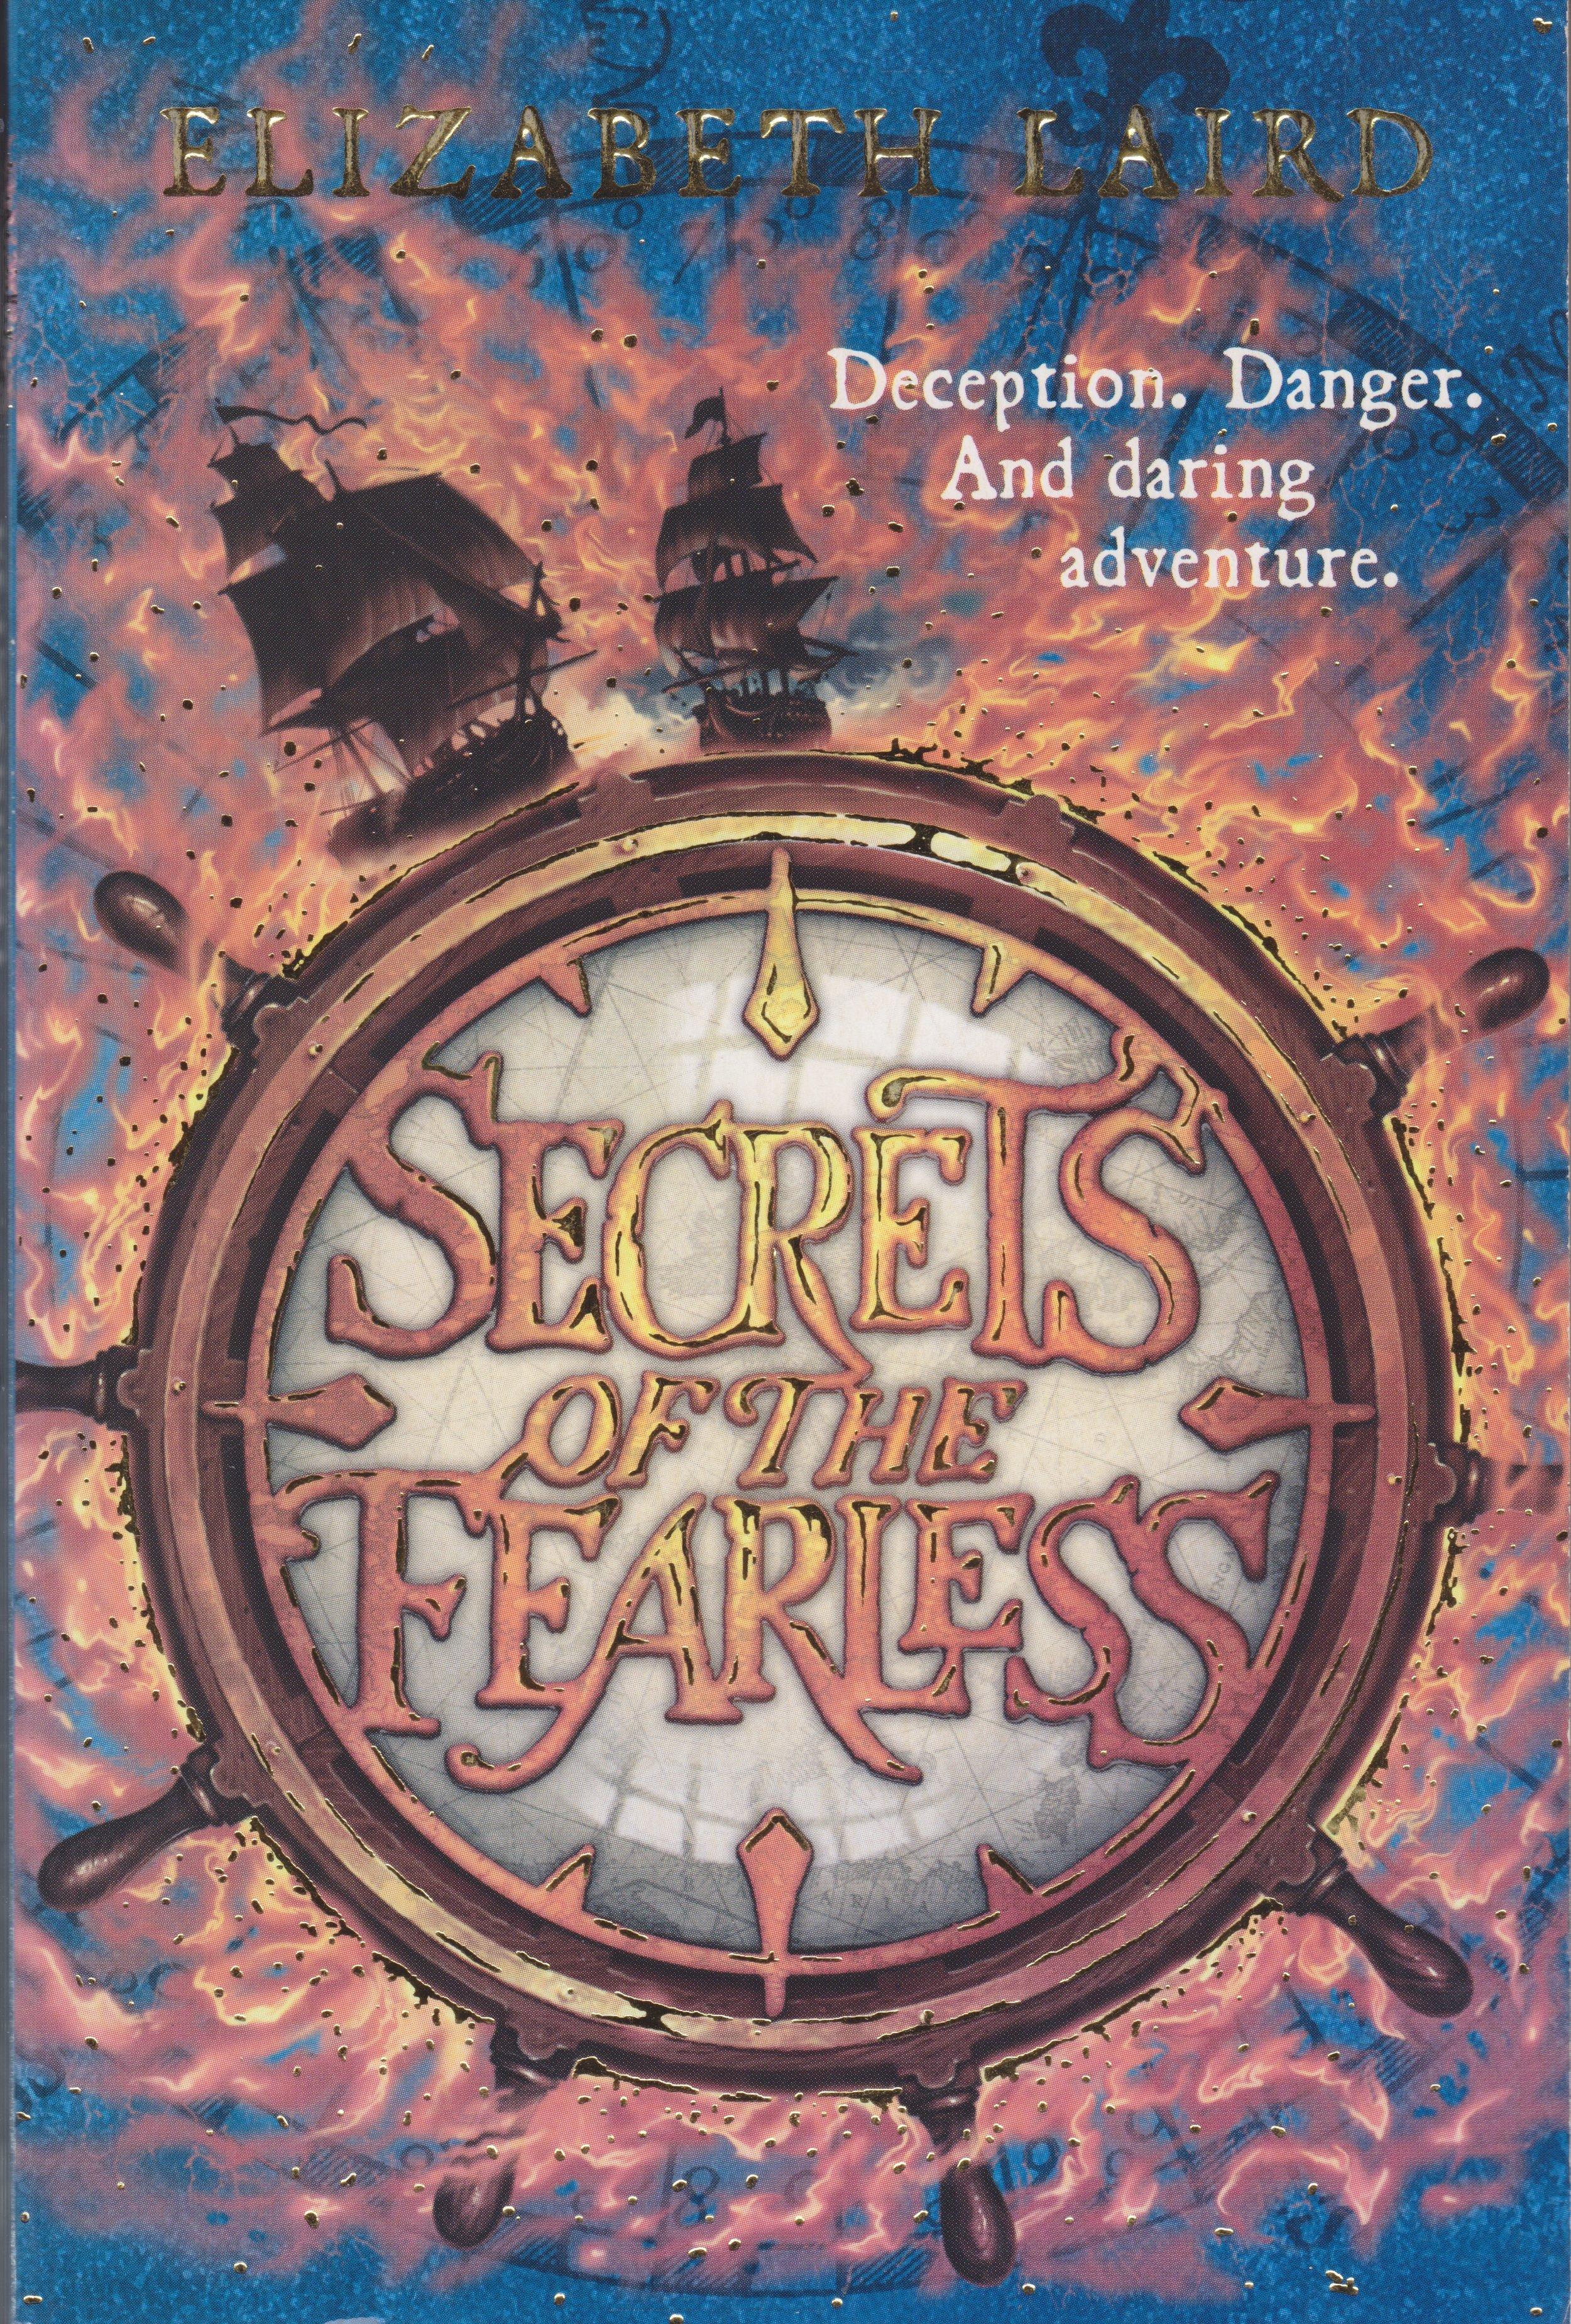 Secrets of the fearless.jpeg